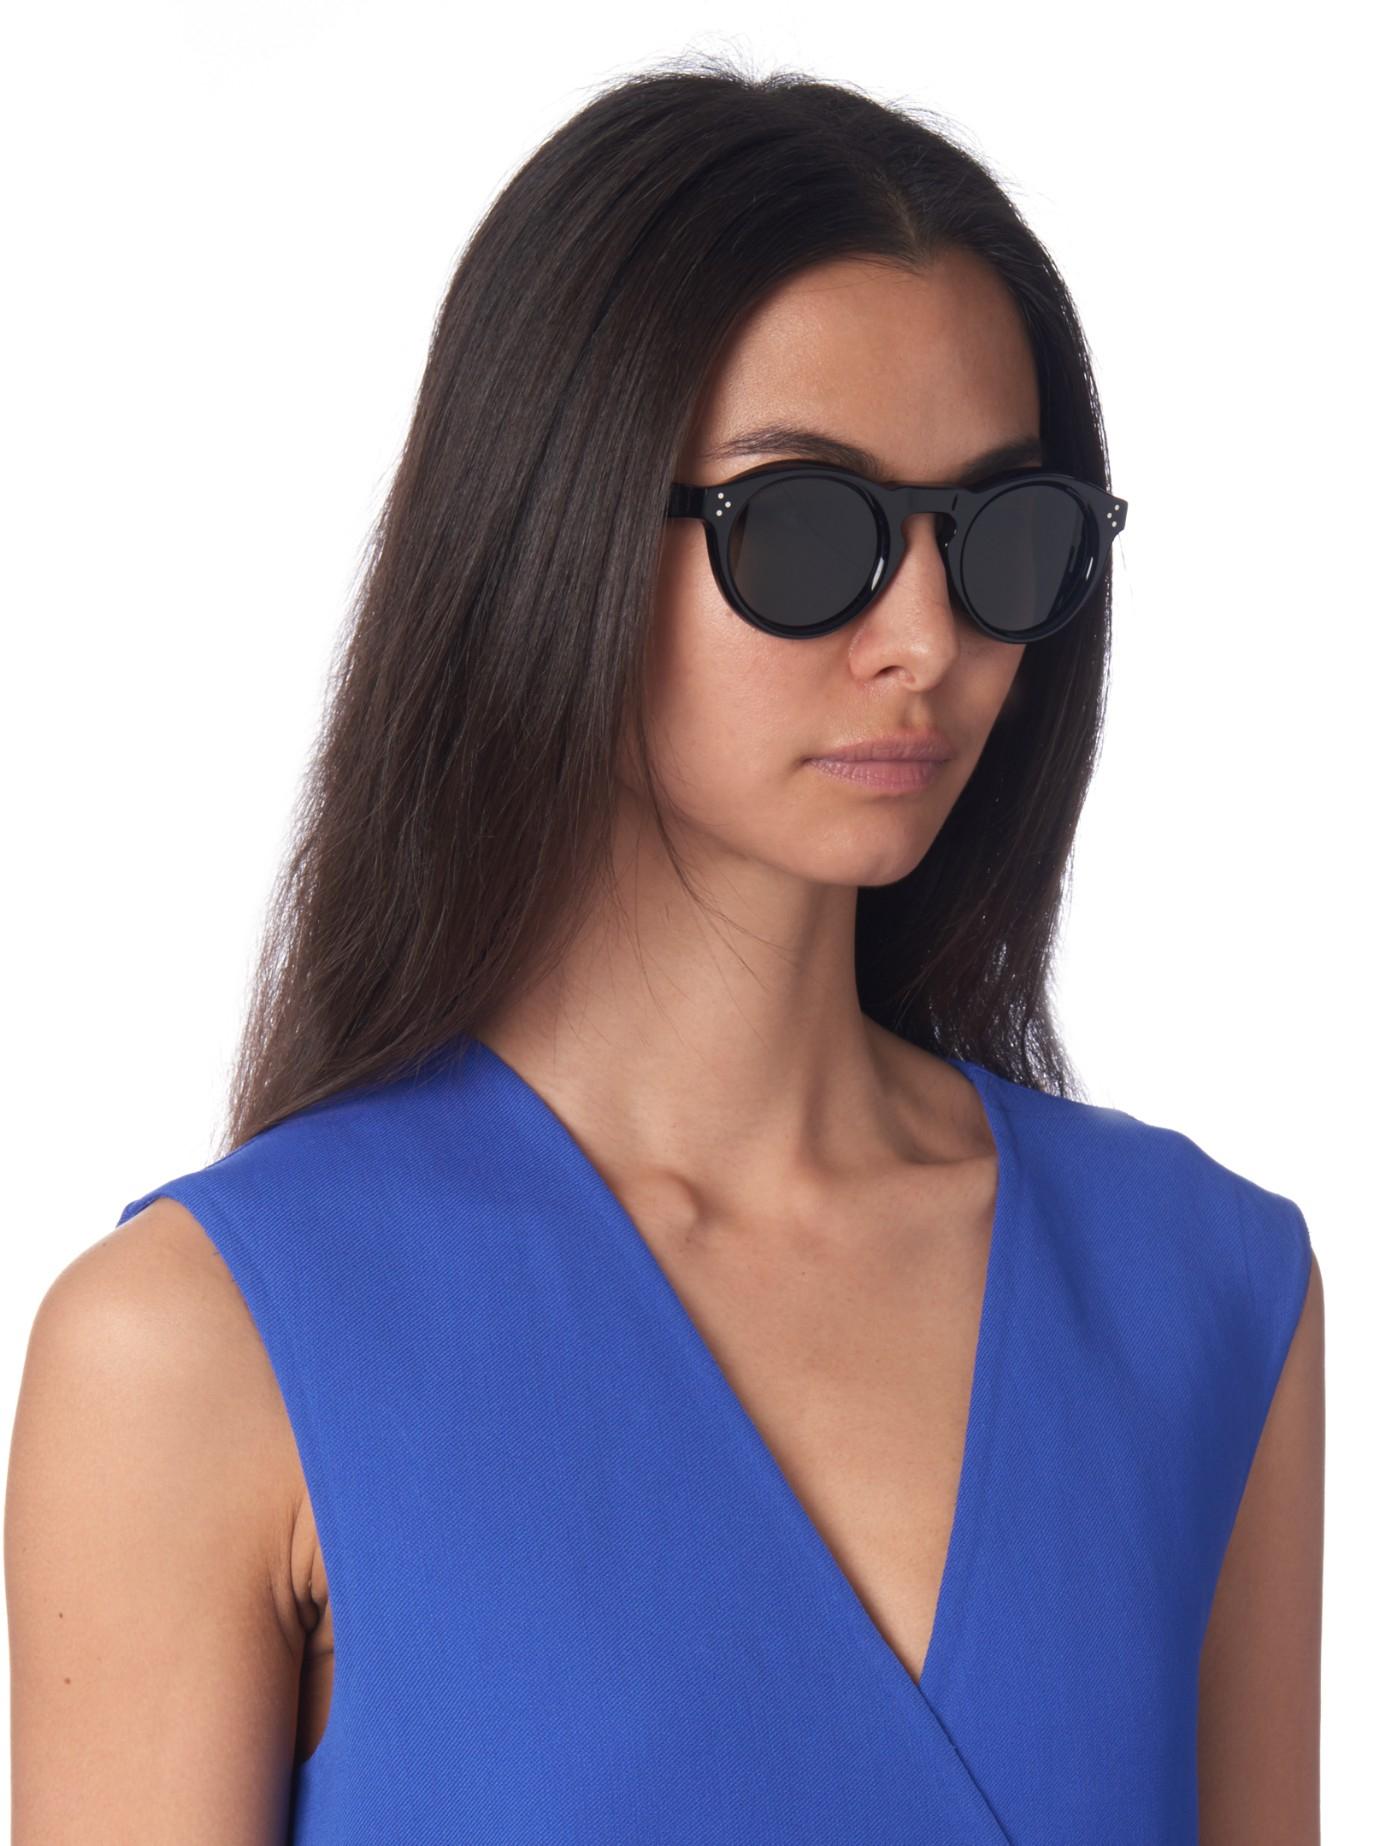 a88c4c6d52 Céline Round-frame Acetate Sunglasses in Black - Lyst